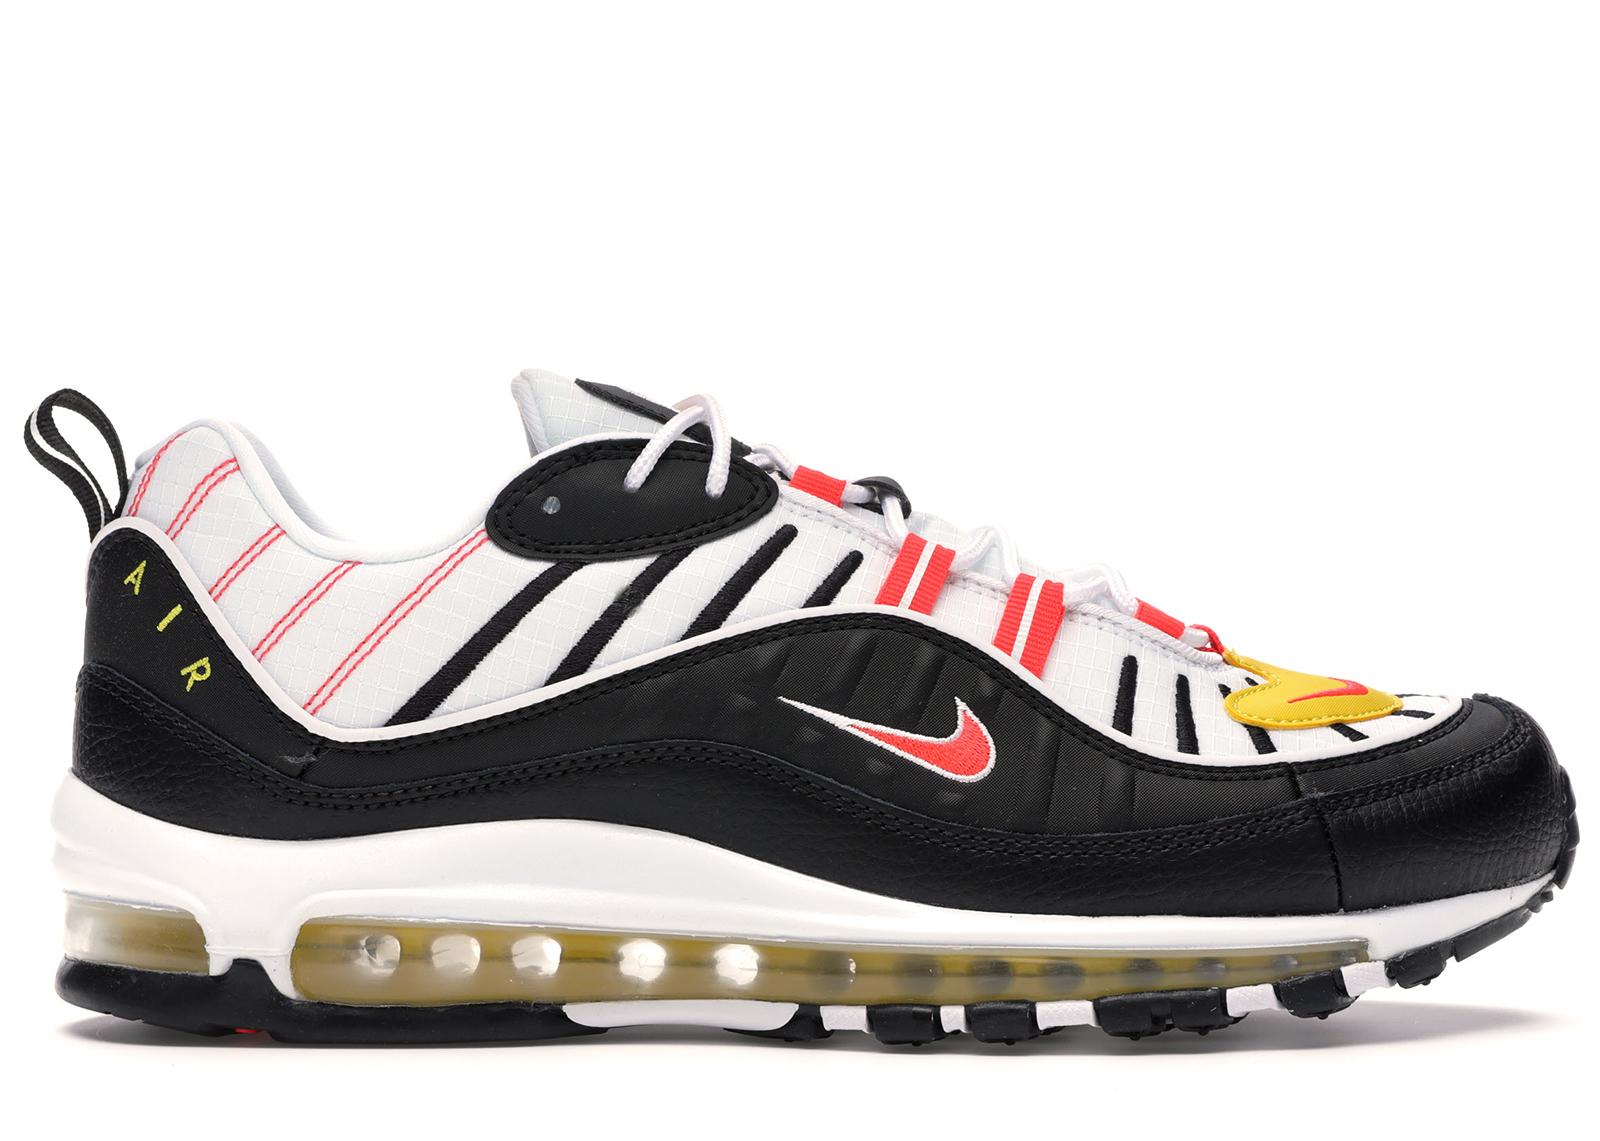 Nike Air Max 98 Black White Yellow Crimson - 640744-016